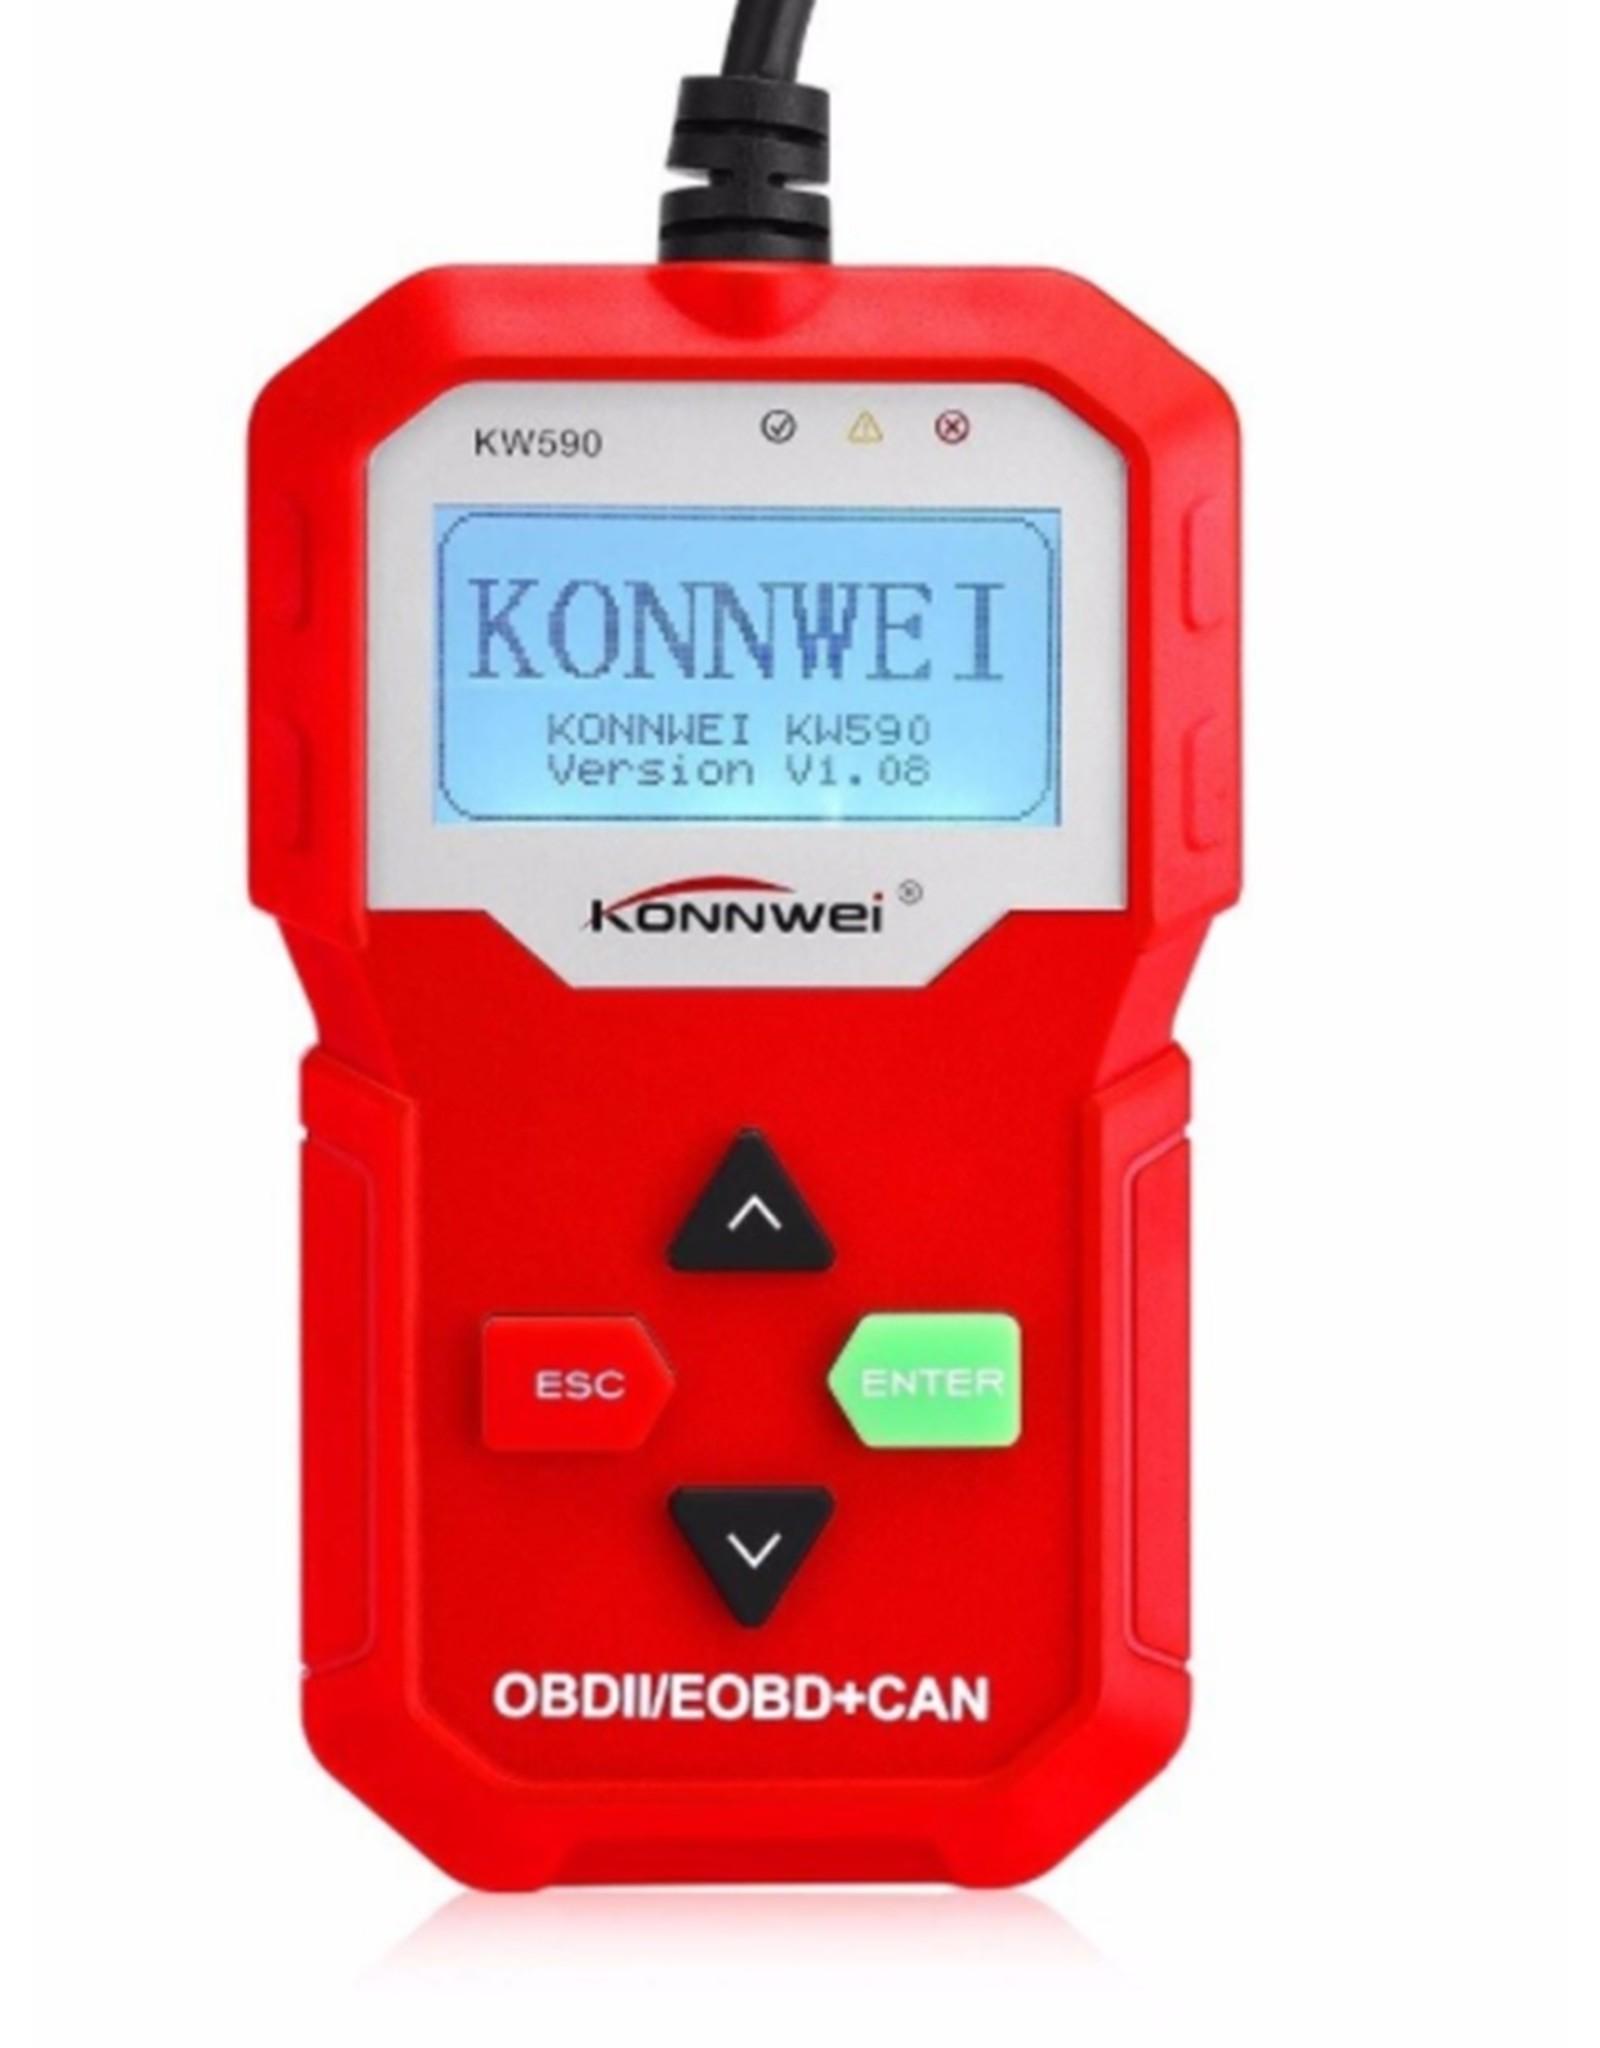 KONNWEI KW590 Diagnosecomputer - OBD2 - EOBD - CAN Handscanner – Diagnoseapparatuur - Motorstoring Codelezer - OBD-scanner